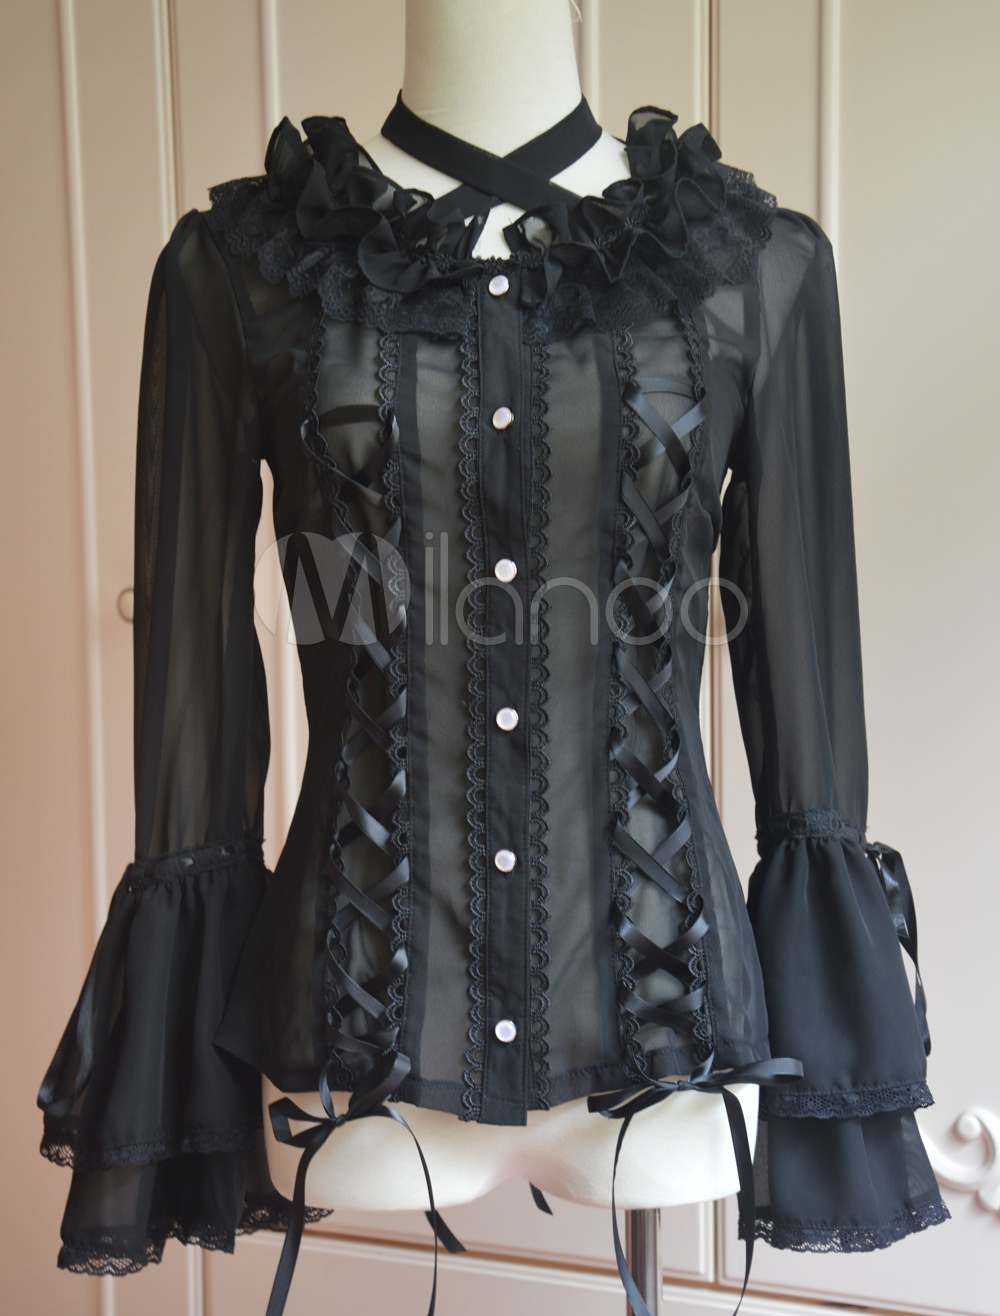 Black Chiffon Lolita Long Hime Sleeves Lace Up Lace Trim Neck Straps